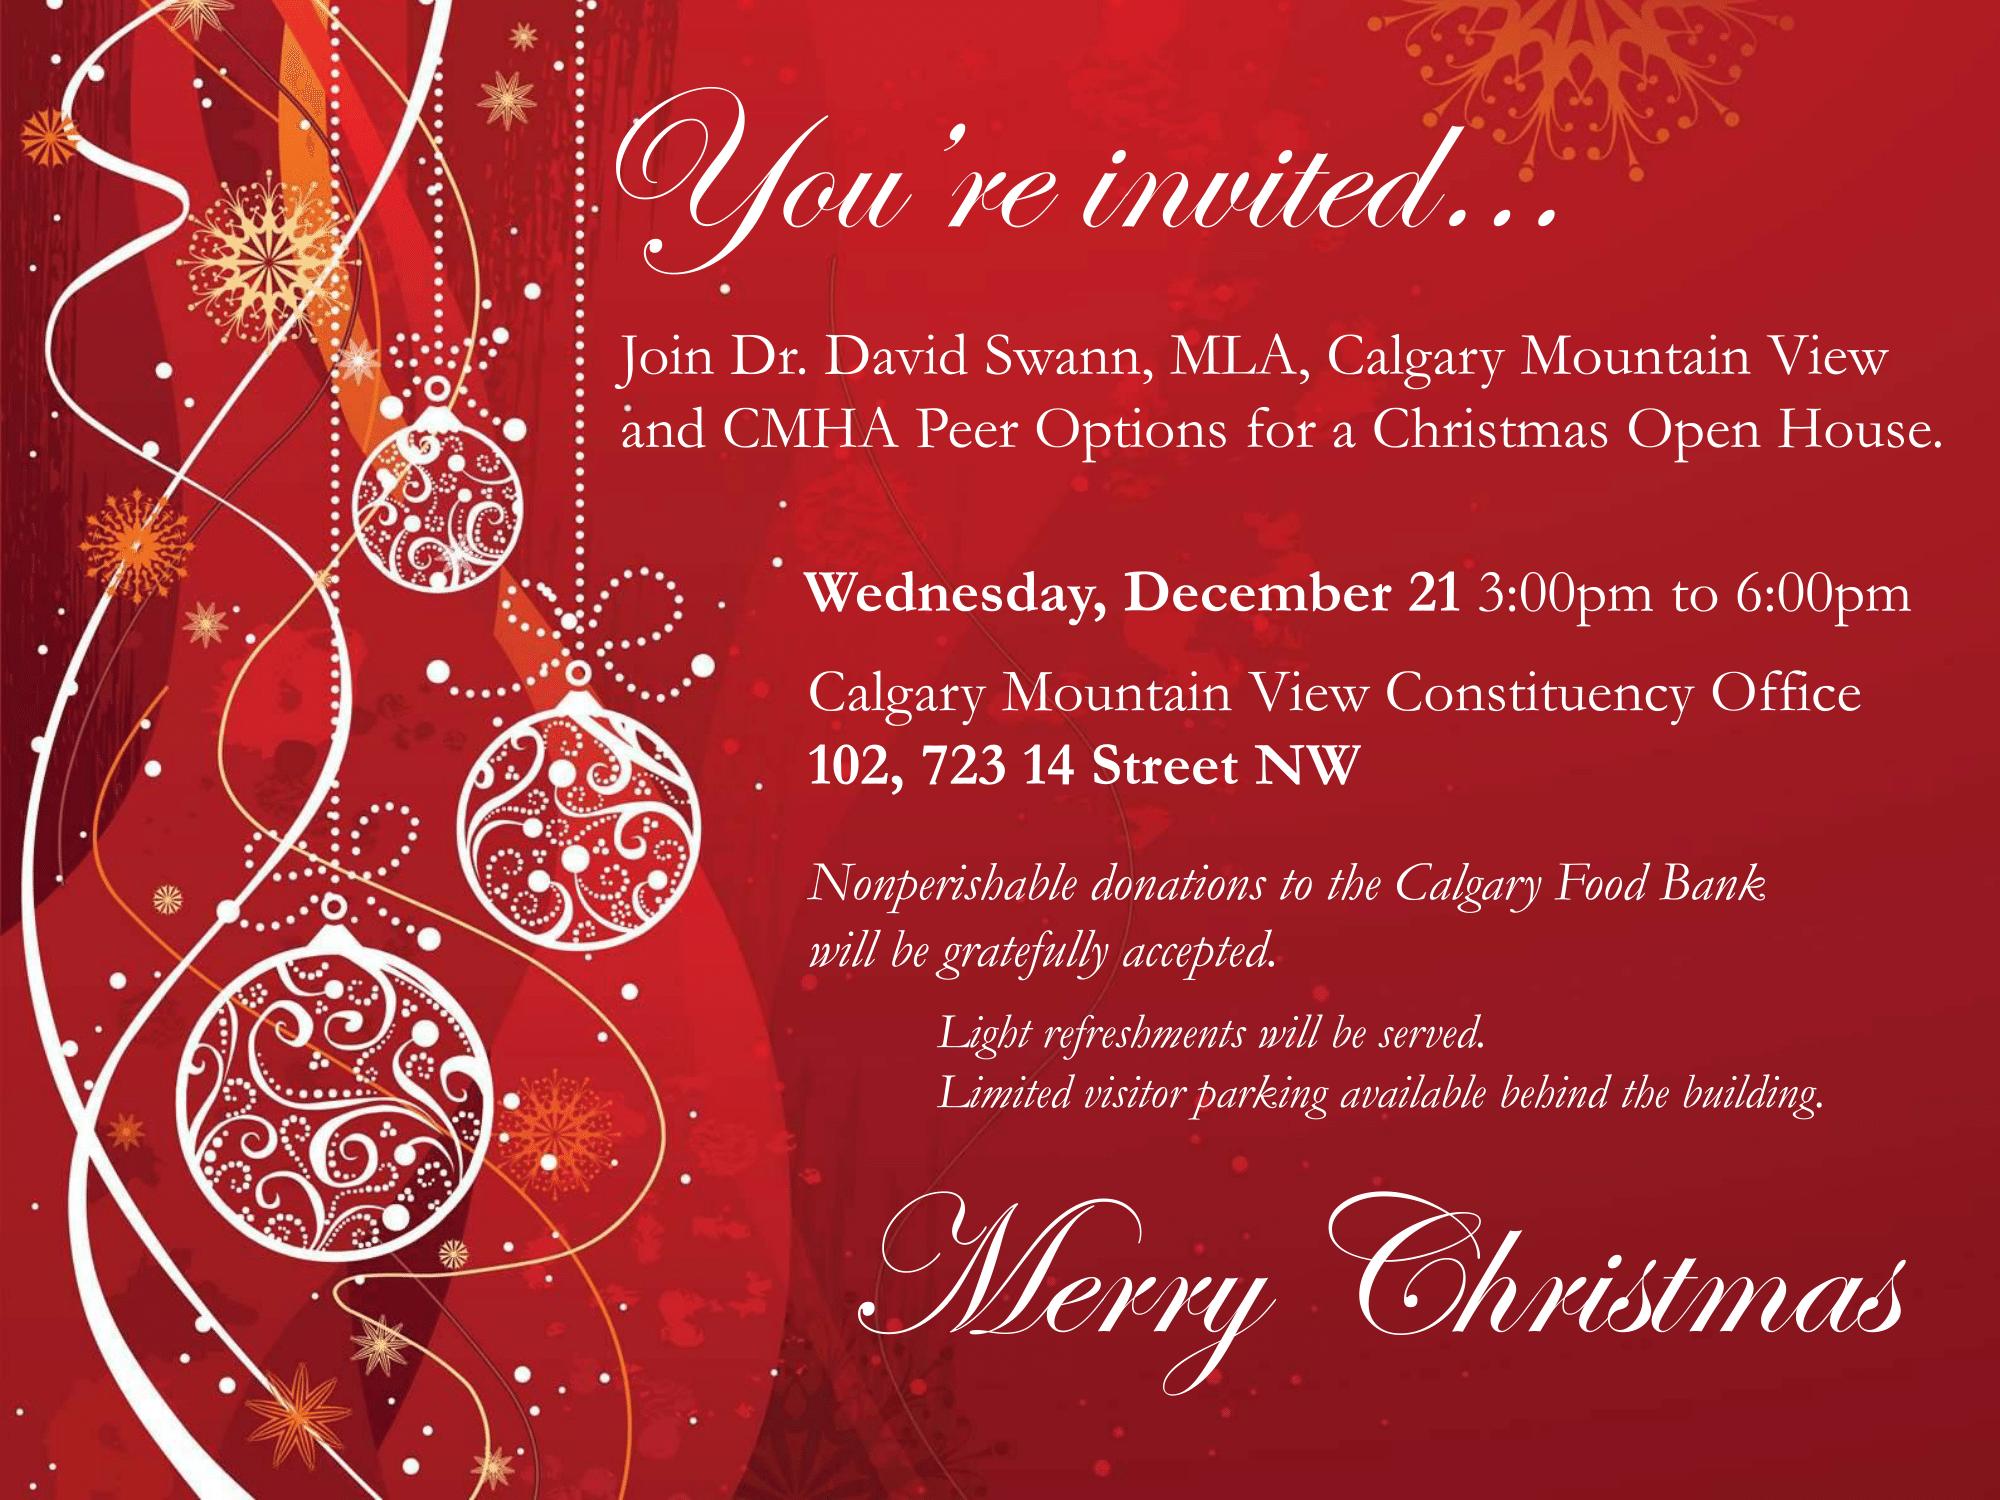 2016-christmas-open-house-invitation